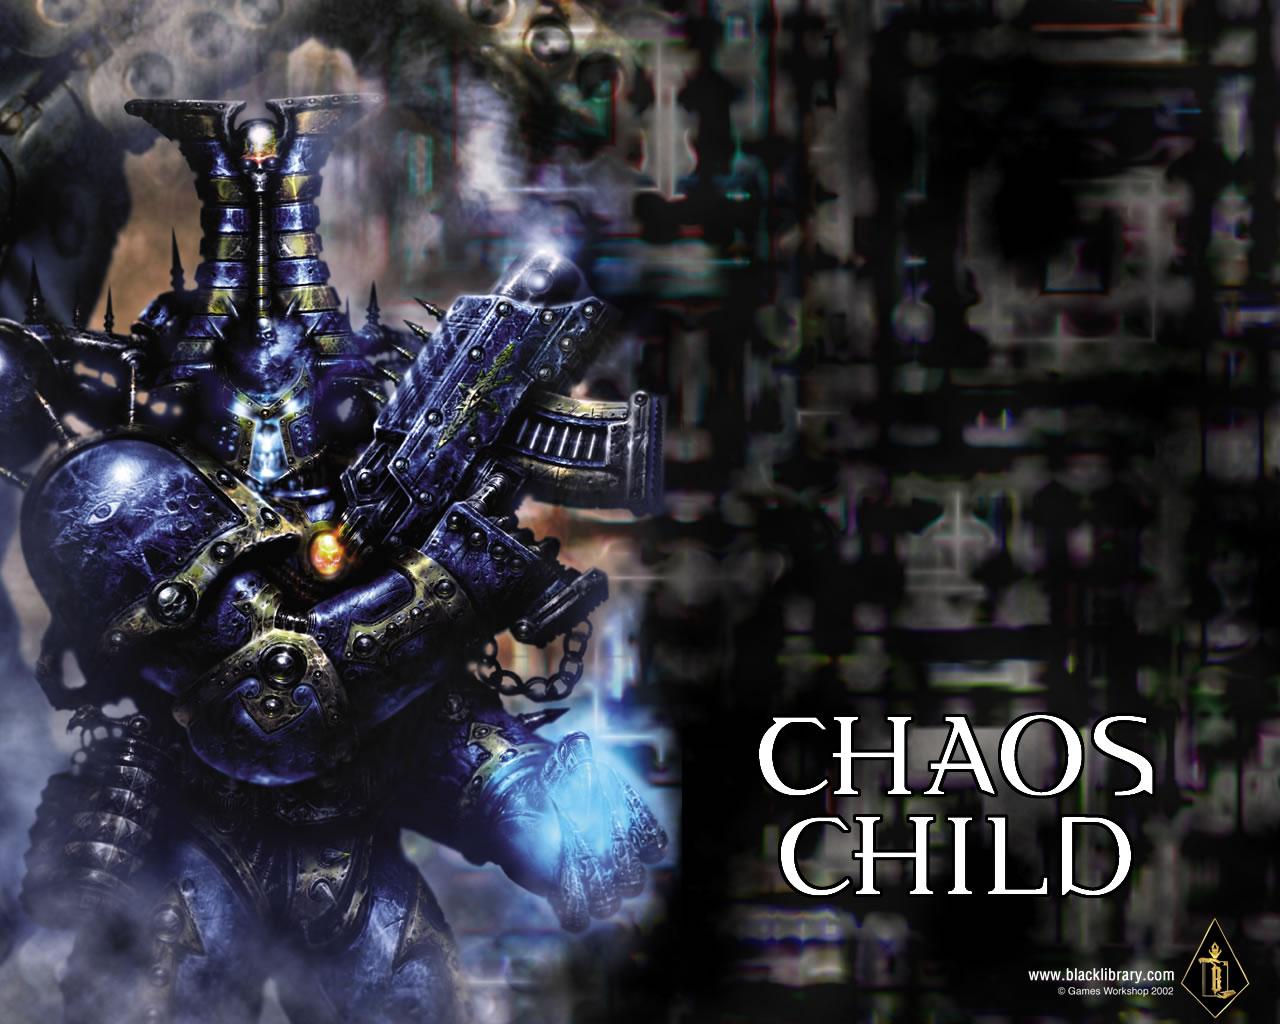 chaoschild - -